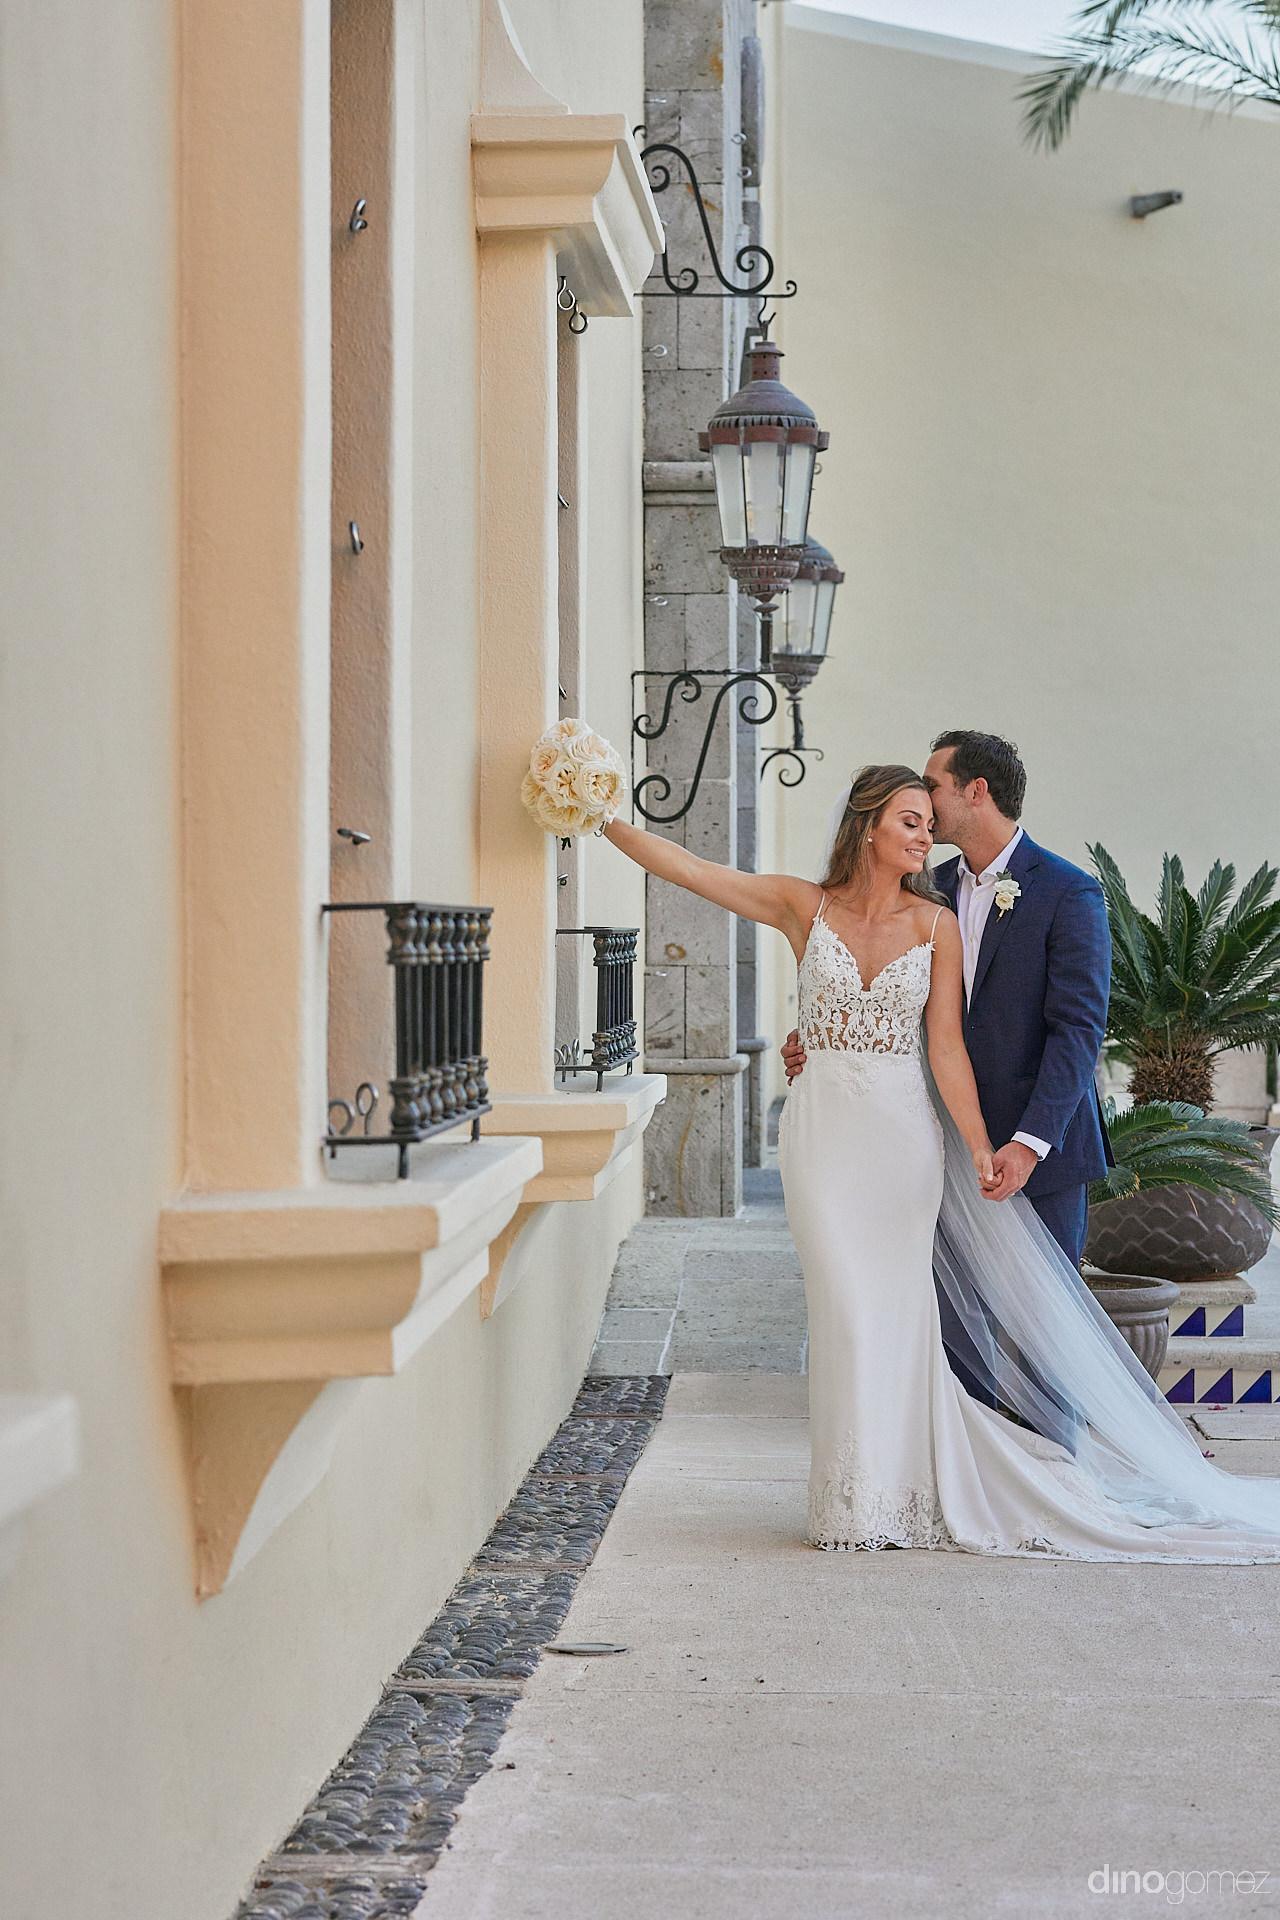 Cabo Destination Wedding - Luxury Wedding Photographer In Cabo Dino Gomez - C&T